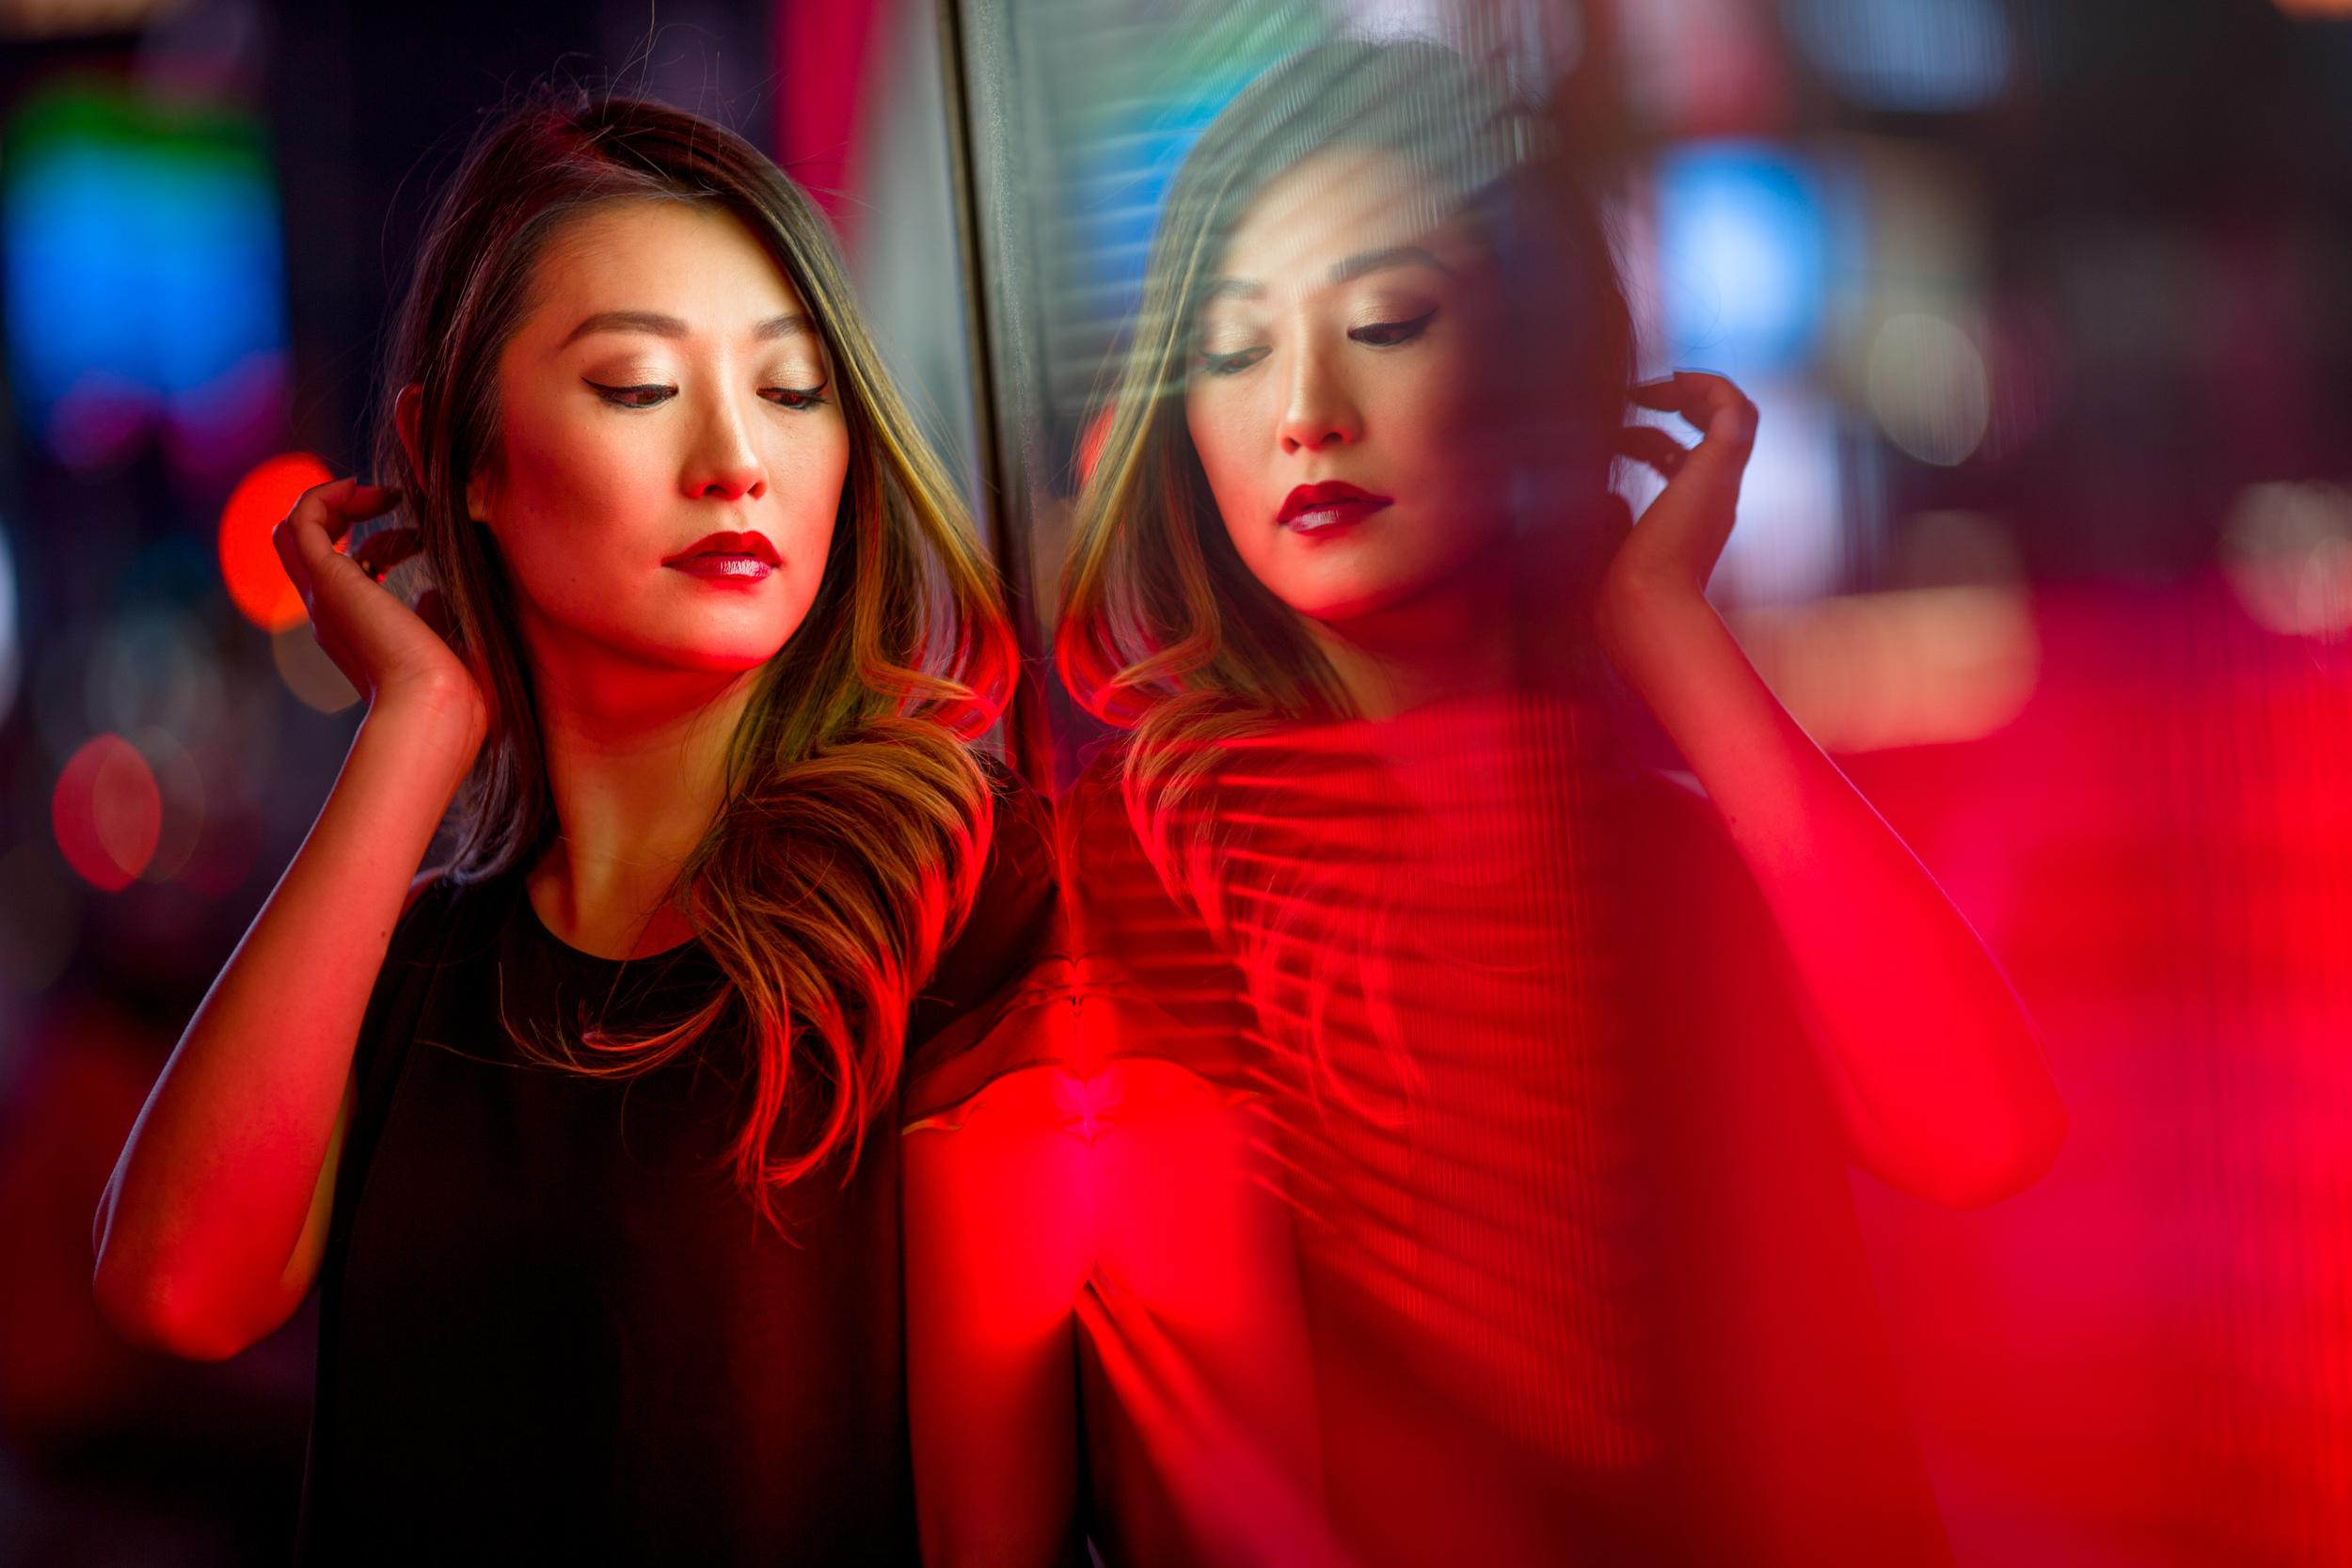 reflection_lights_red.jpg